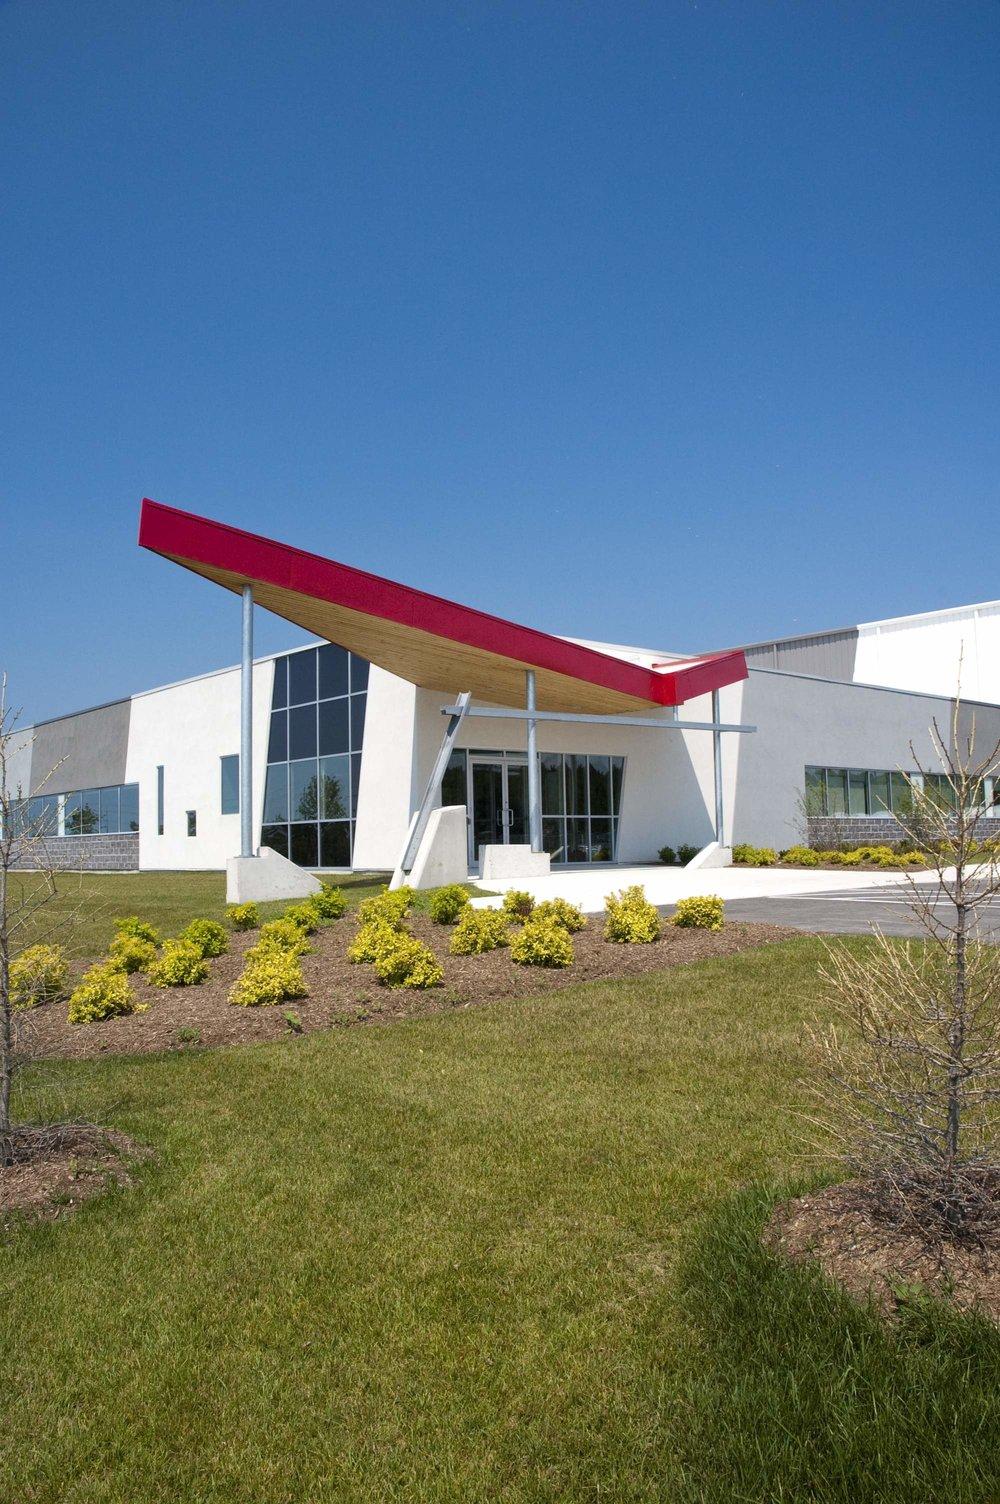 HD Supply Office & Warehouse